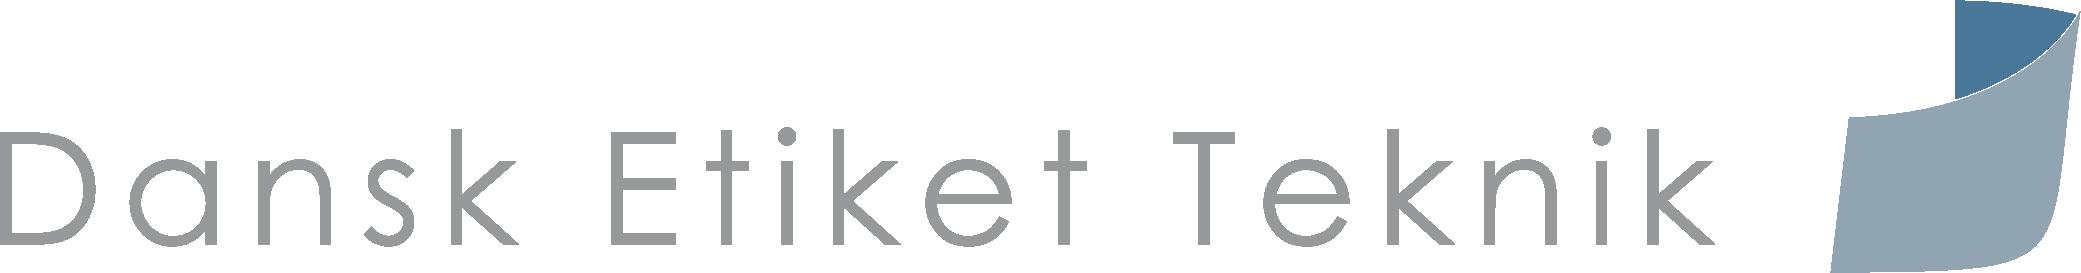 Dansk Etiket Teknik Logo